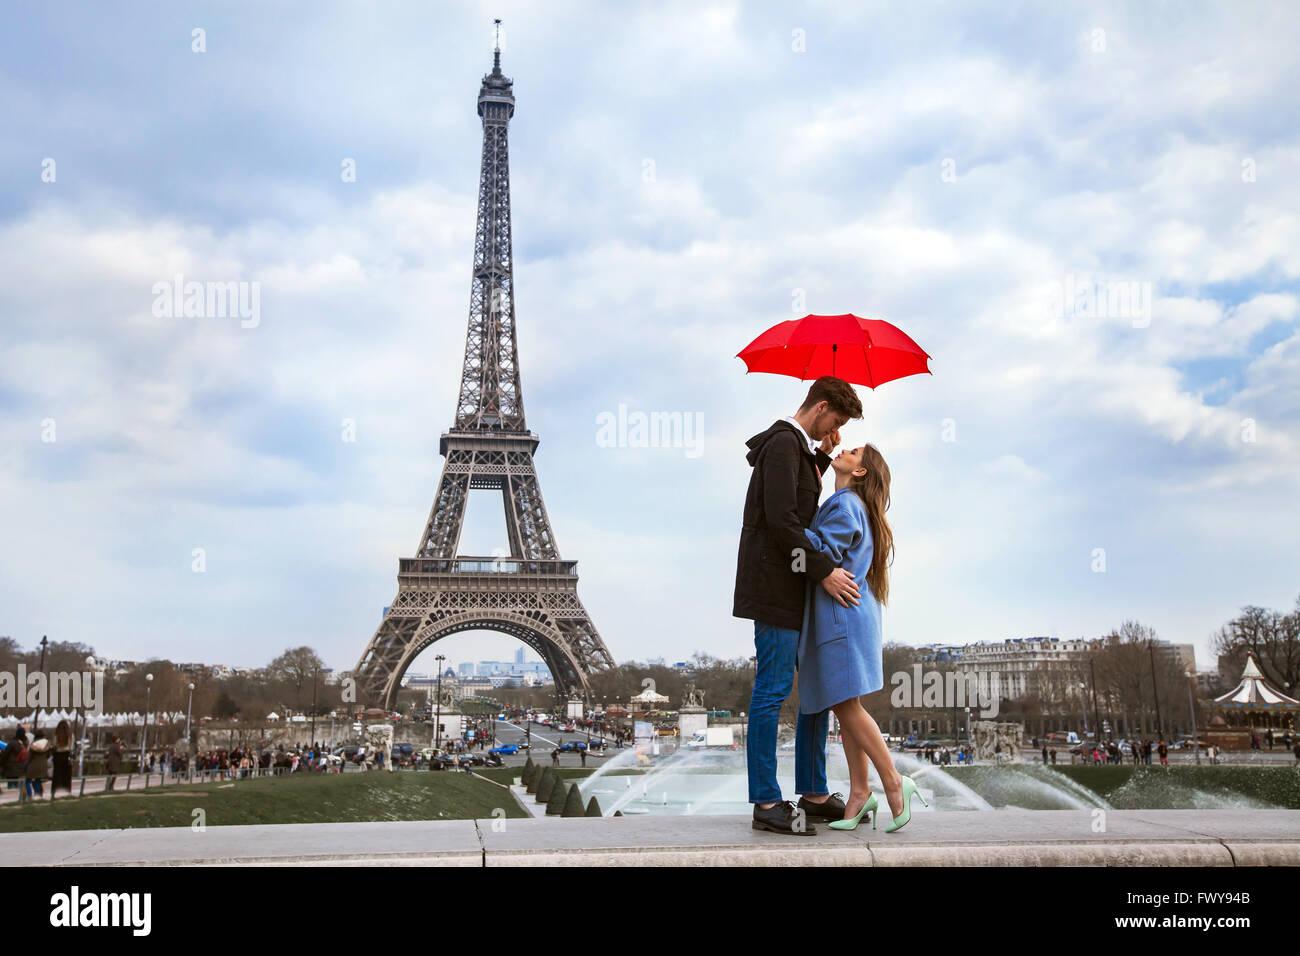 beautiful couple with umbrella near Eiffel Tower, honeymoon in Paris, romantic moment - Stock Image